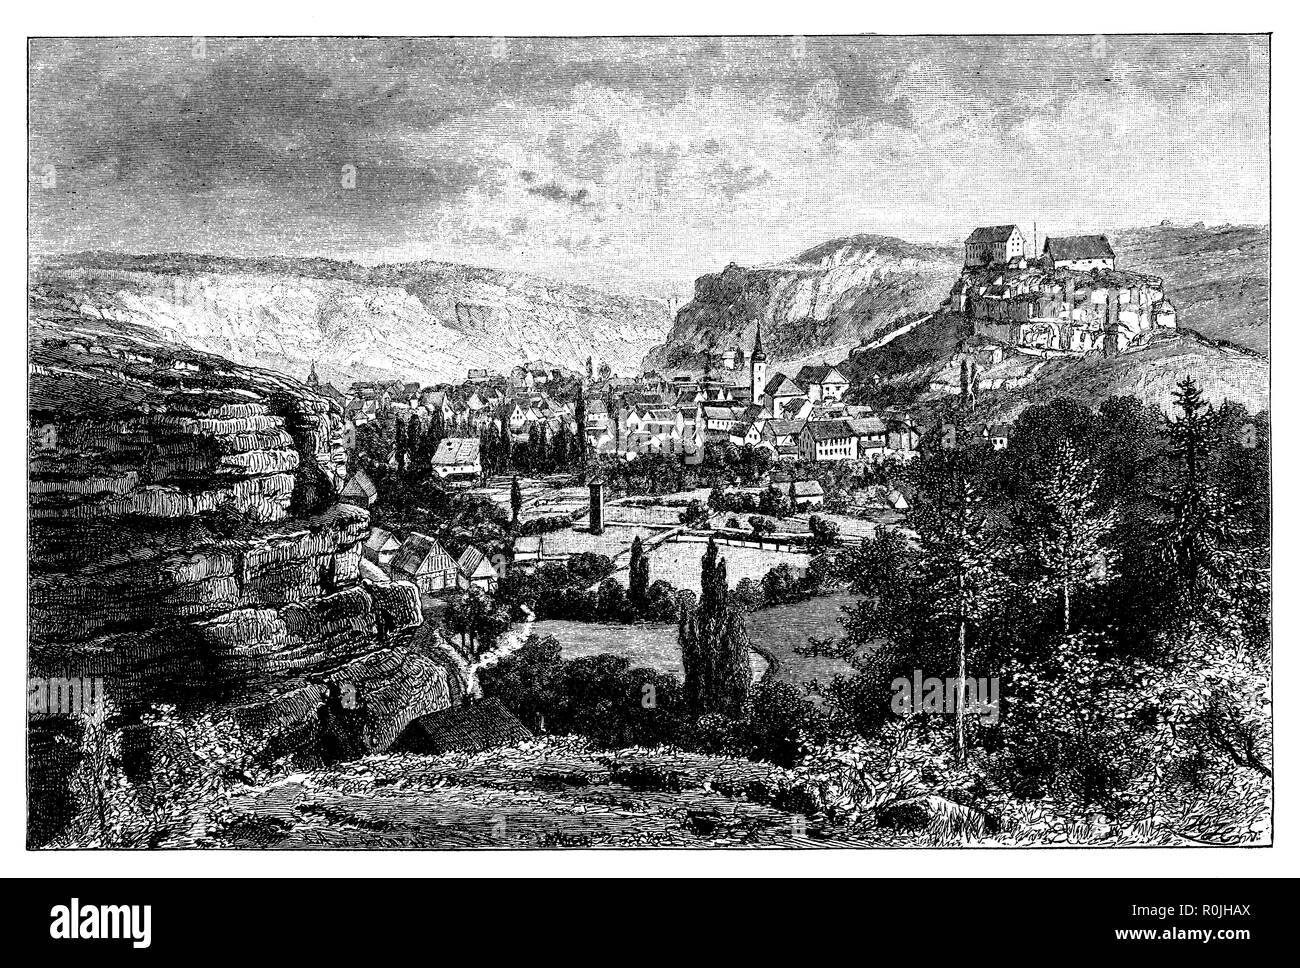 Pottenstein in the Franconian Jura,   1887 - Stock Image